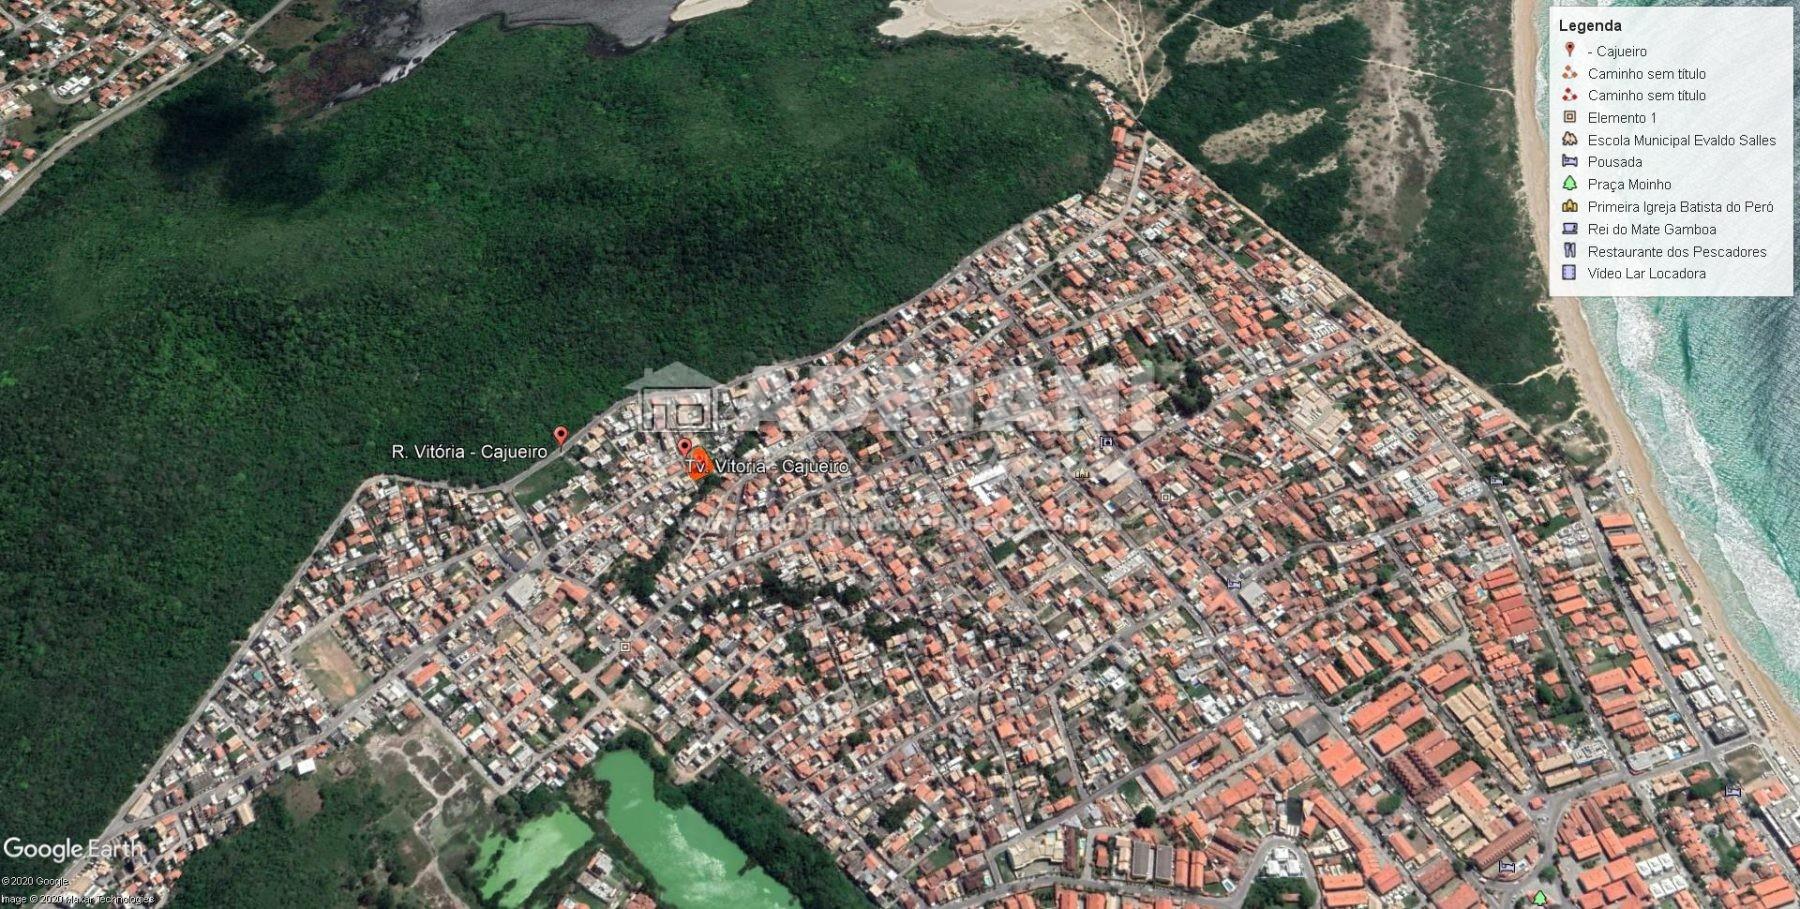 Cód.: 413 Lançamento, VENDA, 6 terrenos, Cajueiro, Cabo Frio – RJ